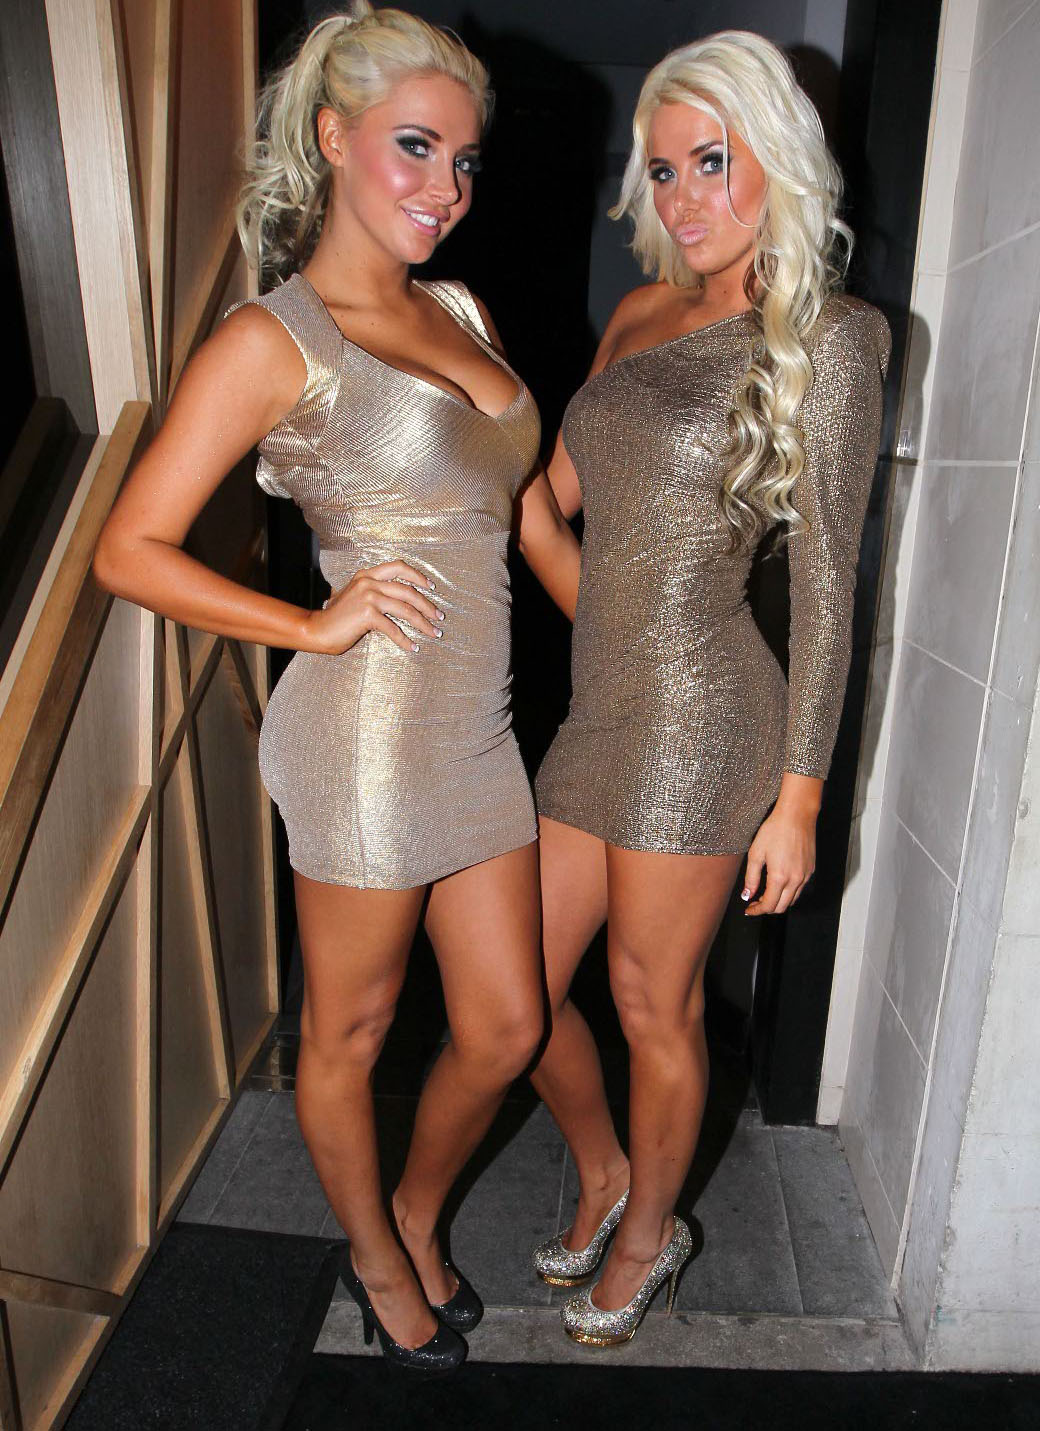 http://1.bp.blogspot.com/-2dfZWEULkbs/TzTifulNEUI/AAAAAAAAE9k/Pz1PGqI6qLw/s1600/karissa_and_kristina_shannon_silver.jpg